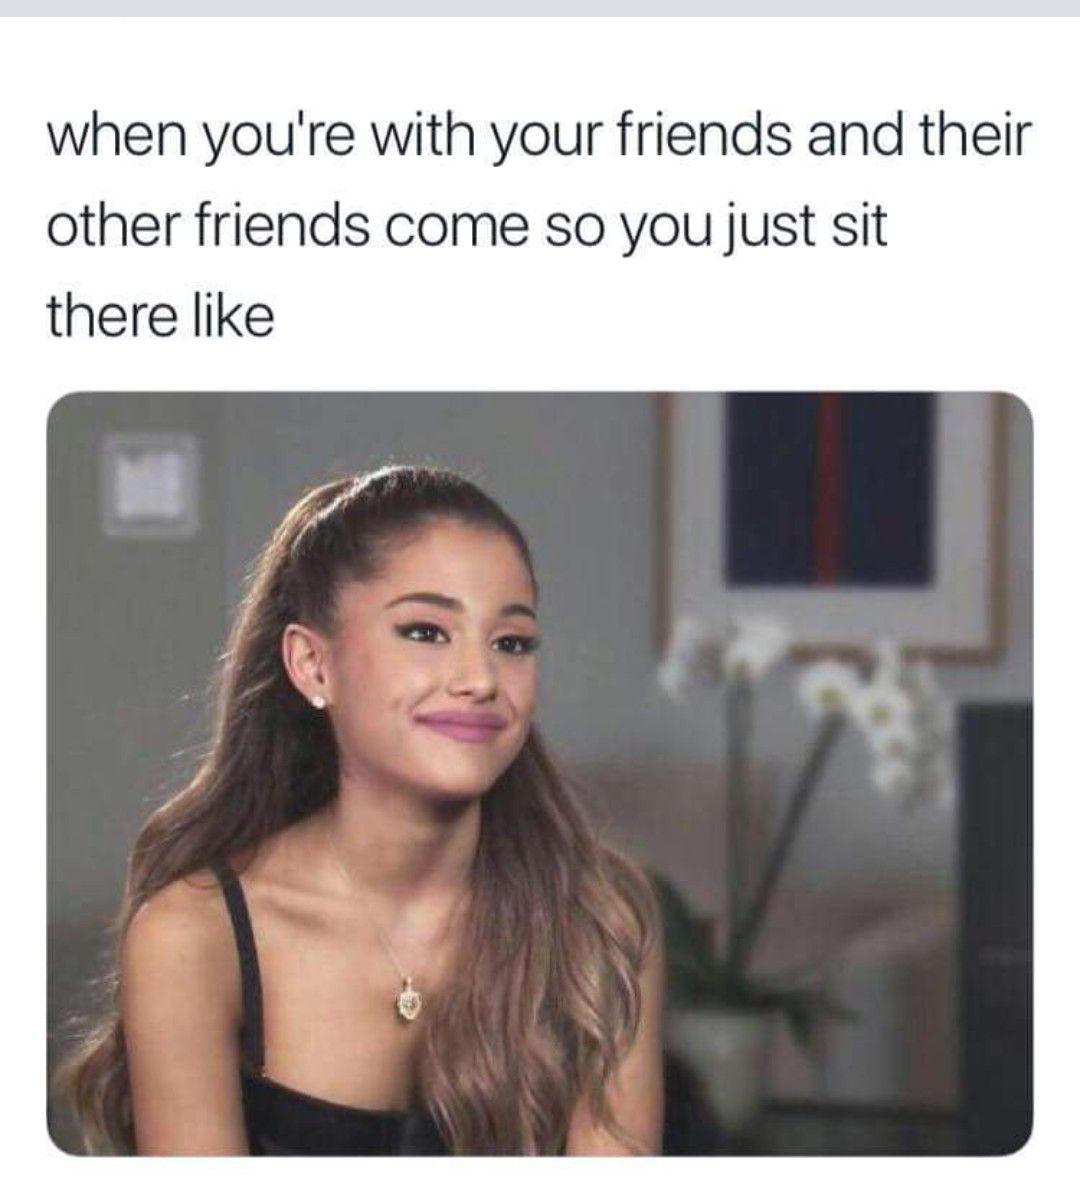 flirting quotes to girls meme funny friends meme